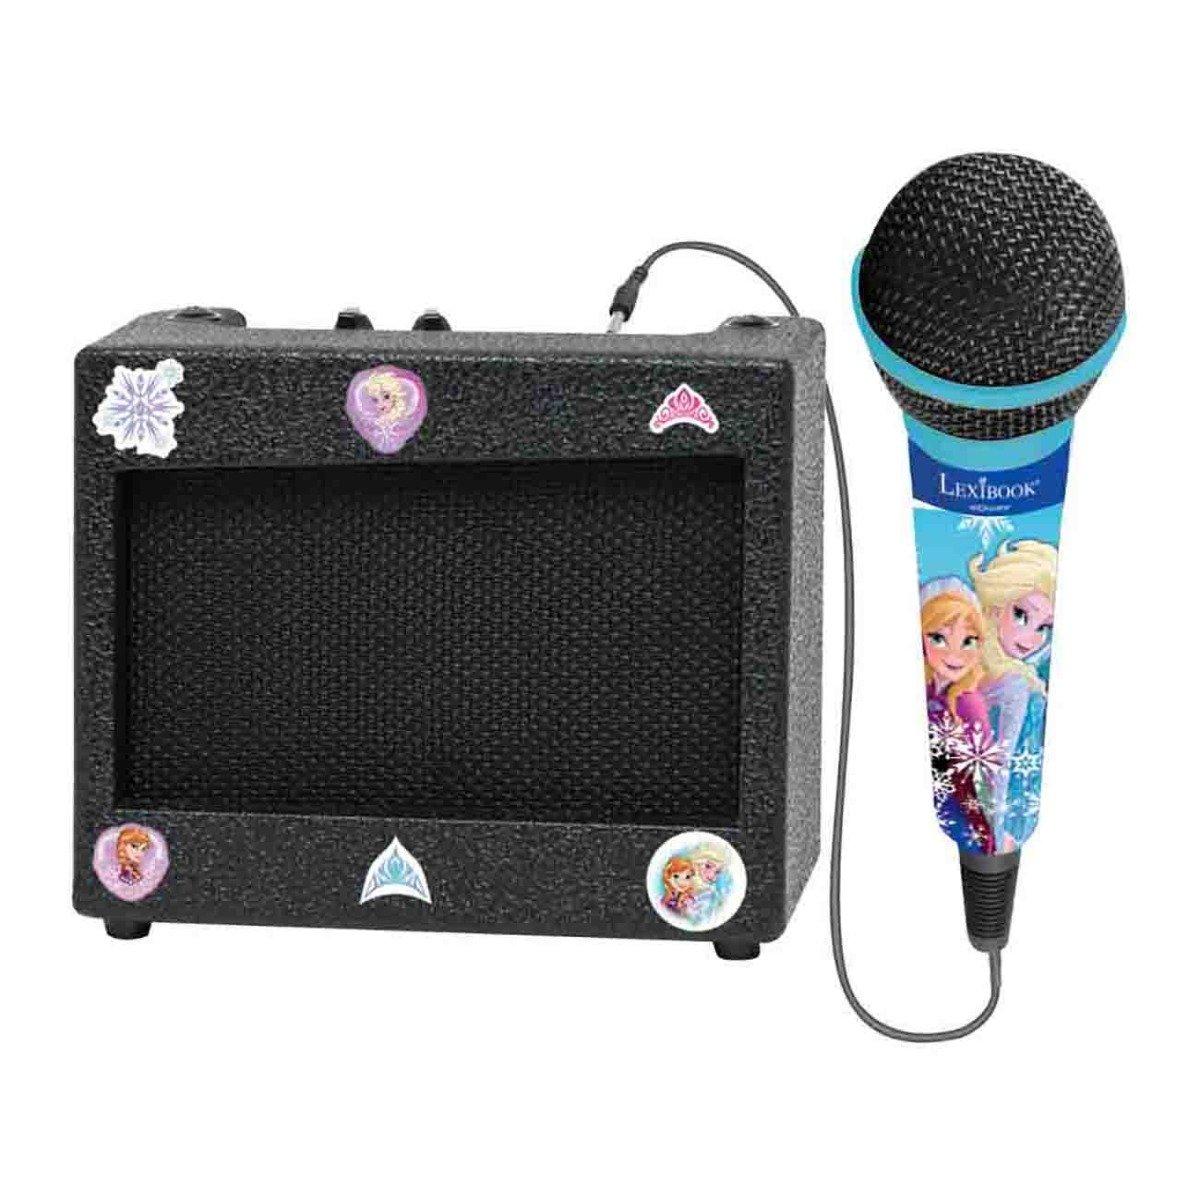 Karaoke portabil cu amplificator si microfon, Disney Frozen 2